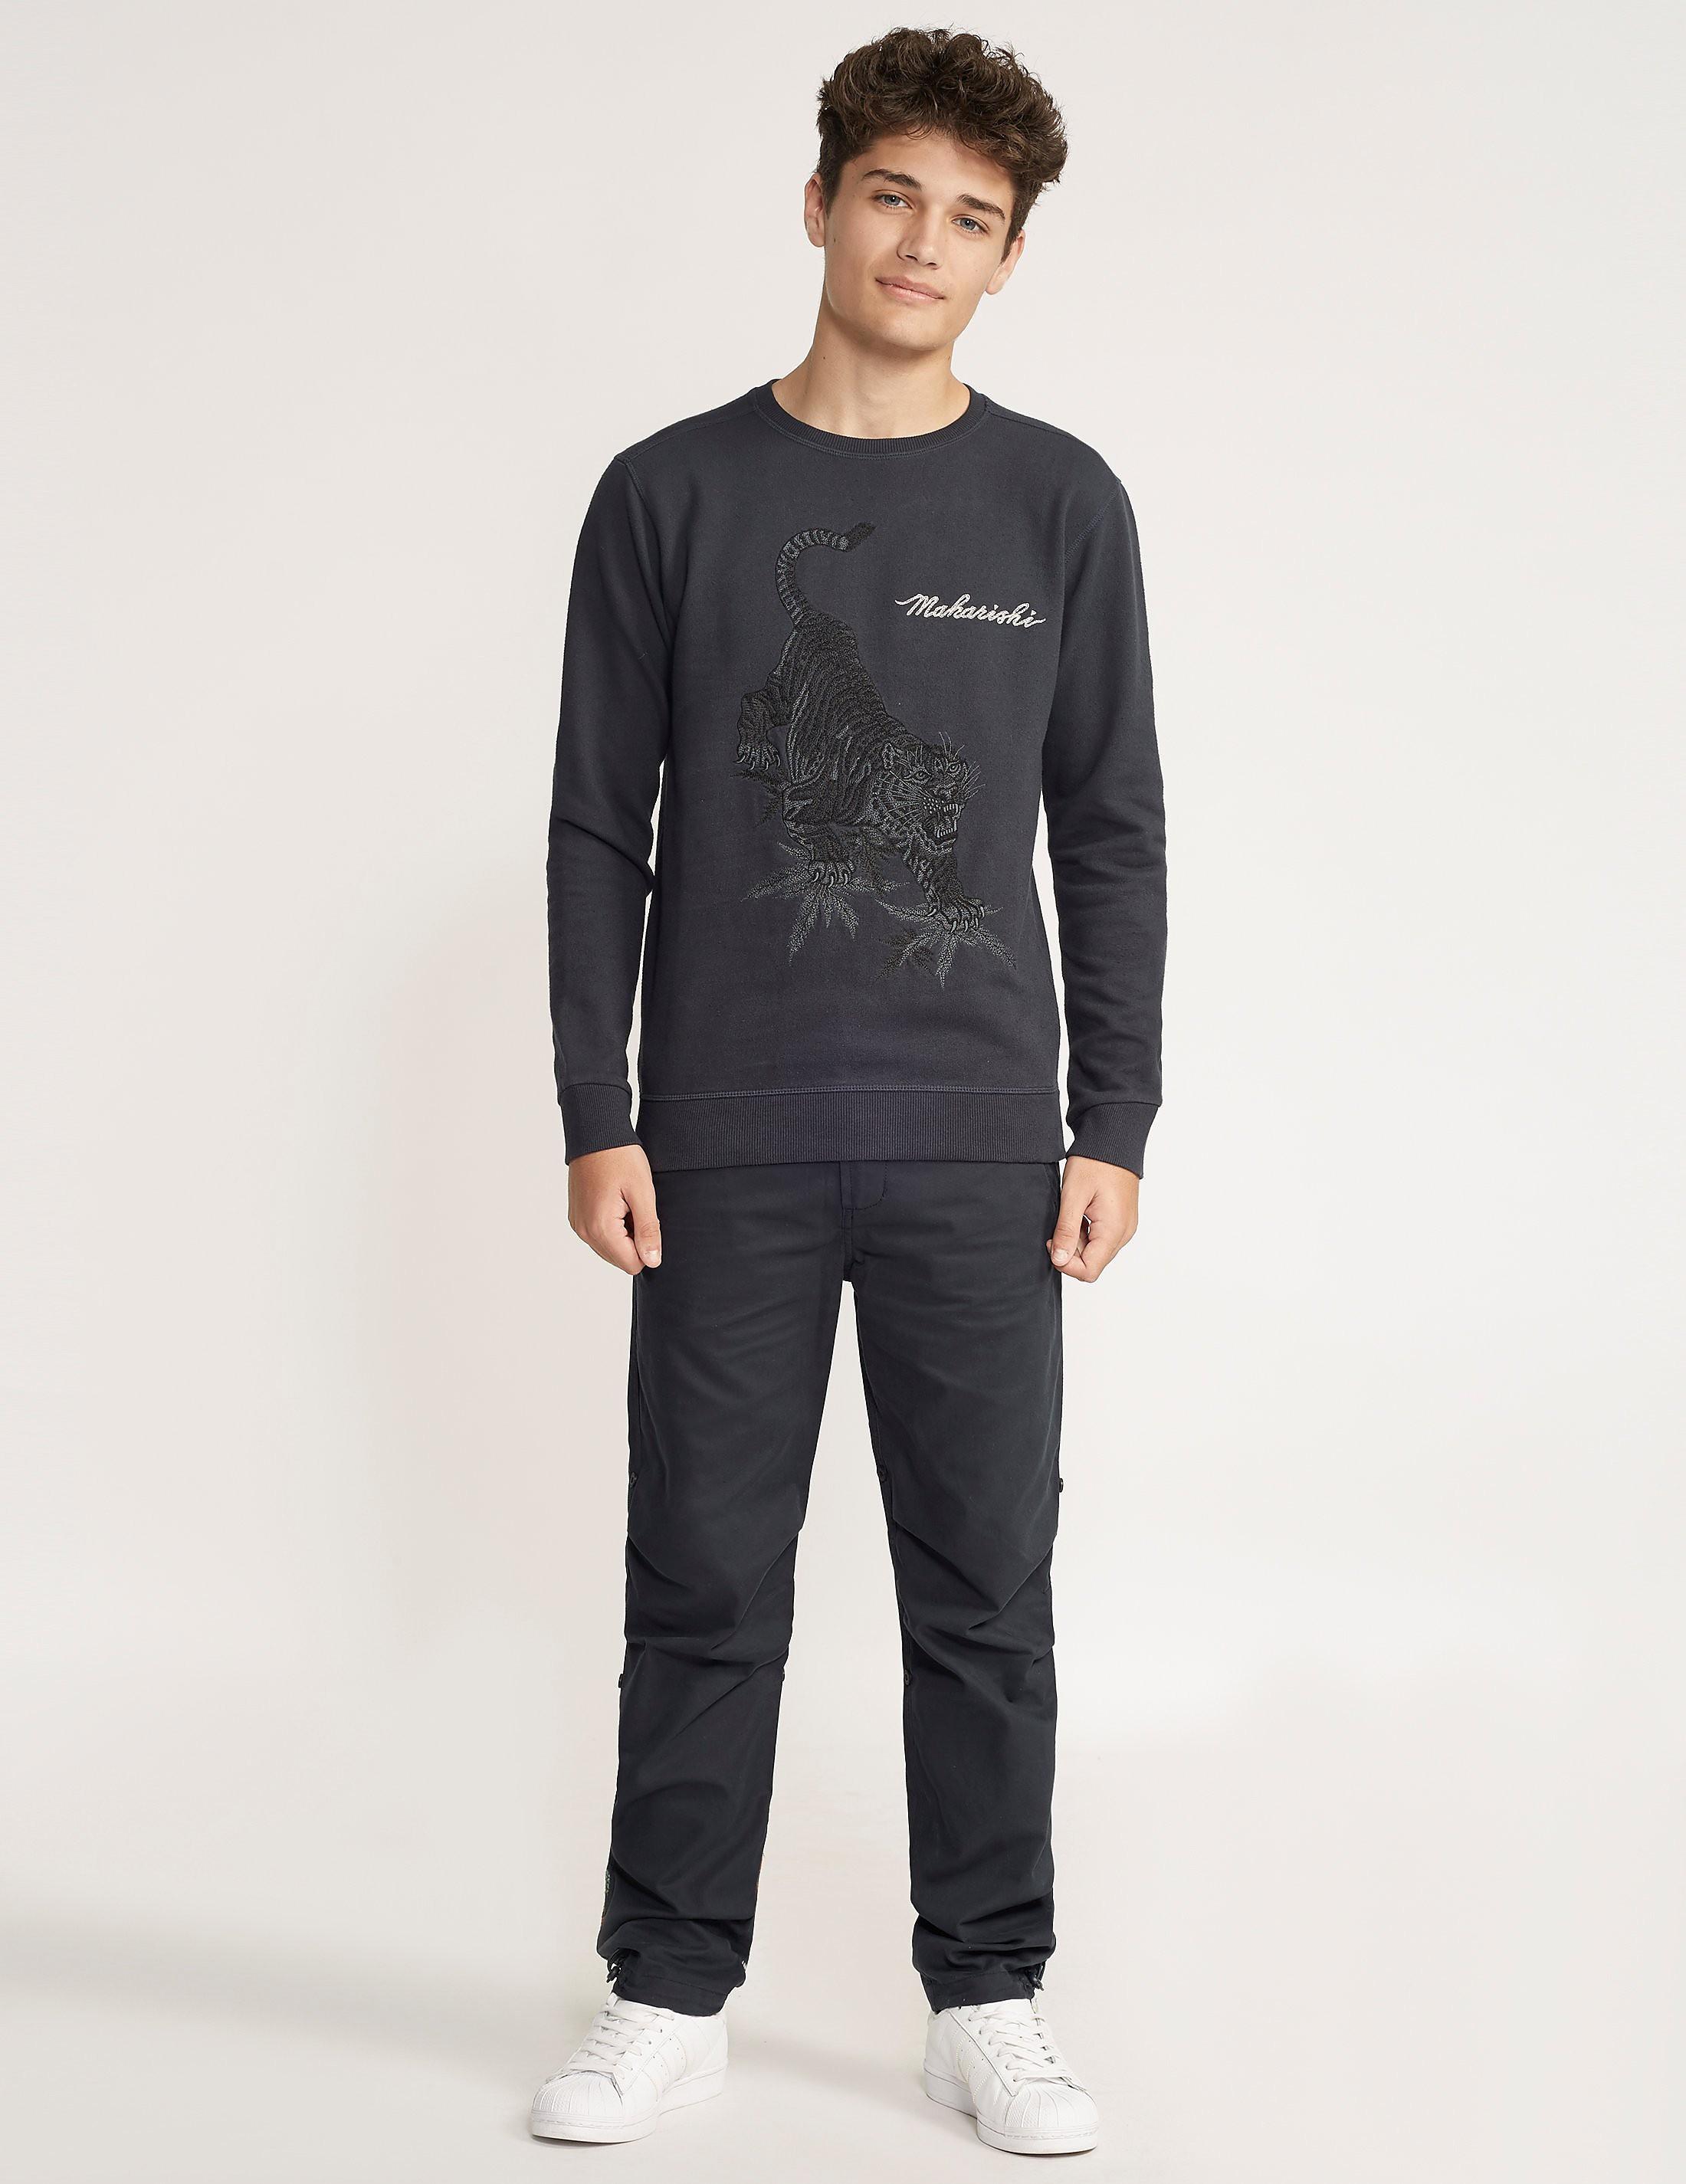 Maharishi Tiger Sweatshirt